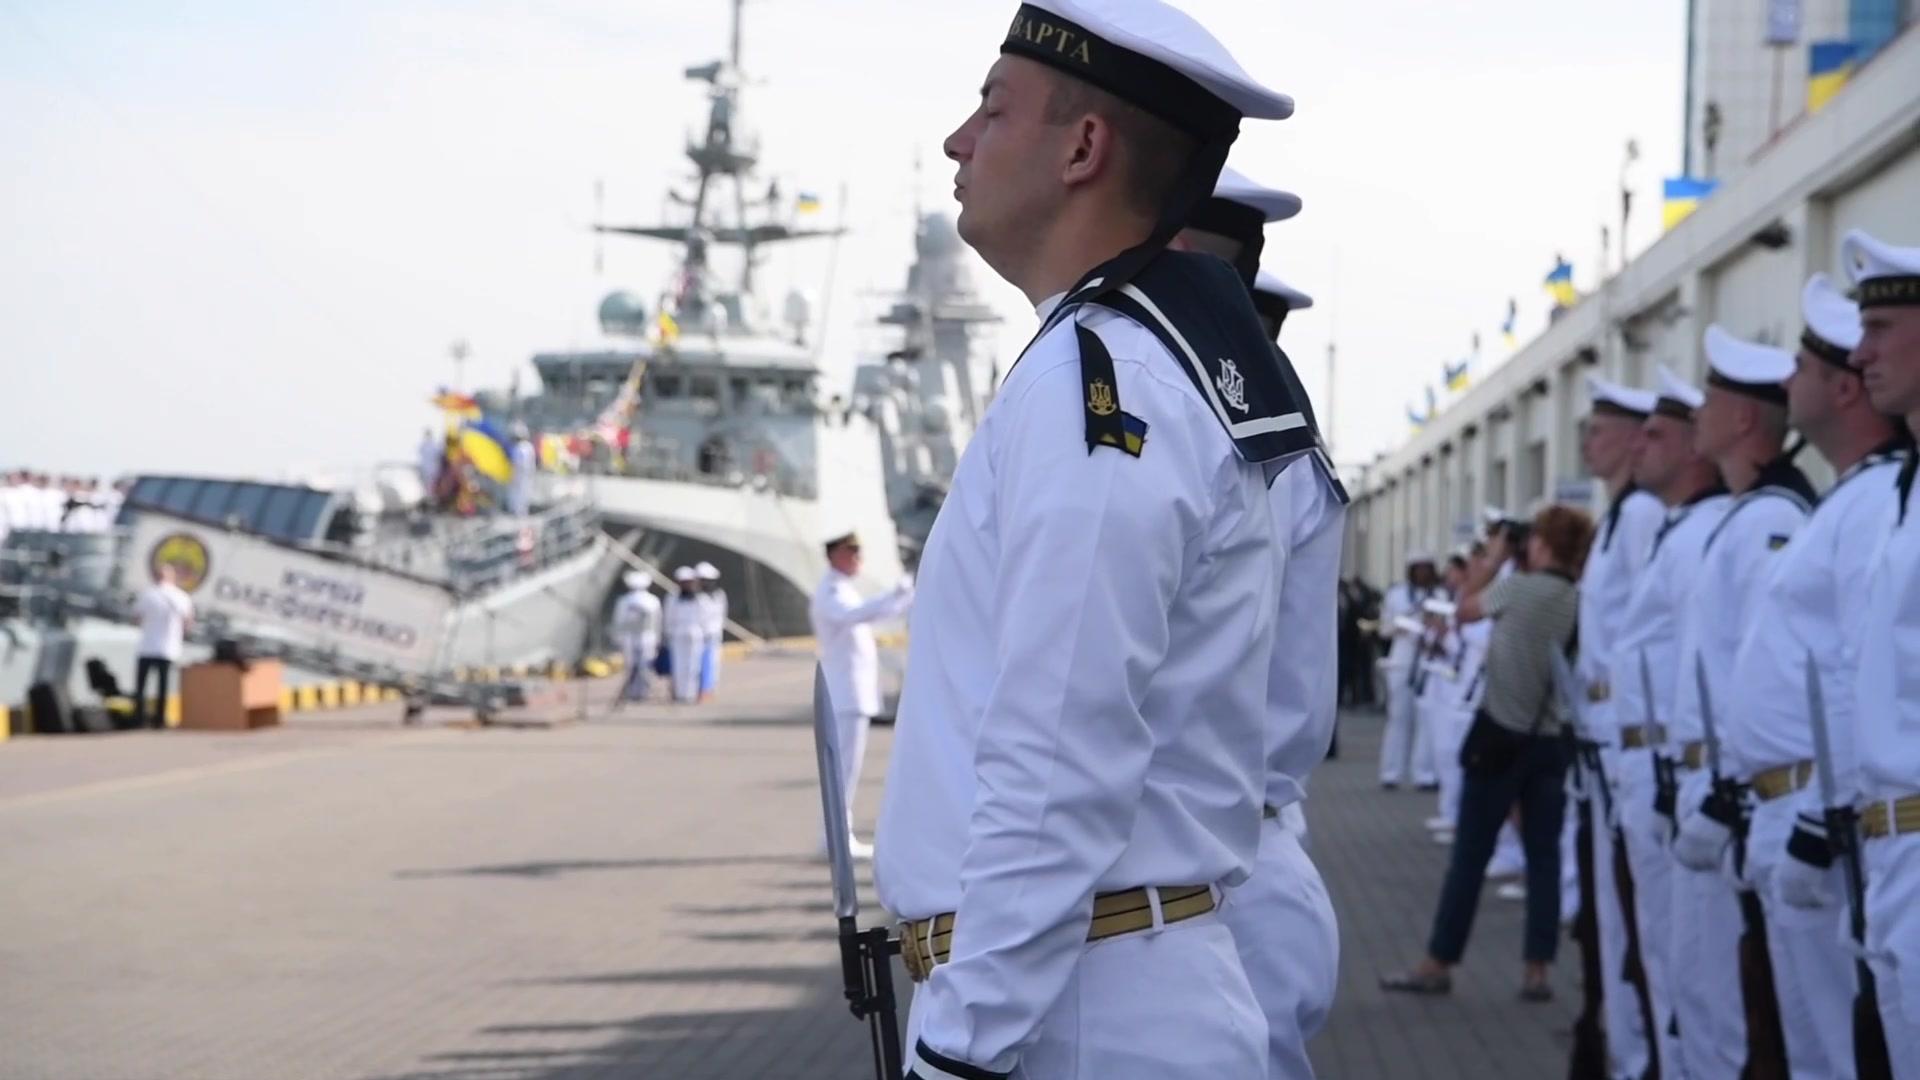 NATO Partners & Allies Take Part in Ukrainian Navy Day • ODESA Ukraine • July 5 2021